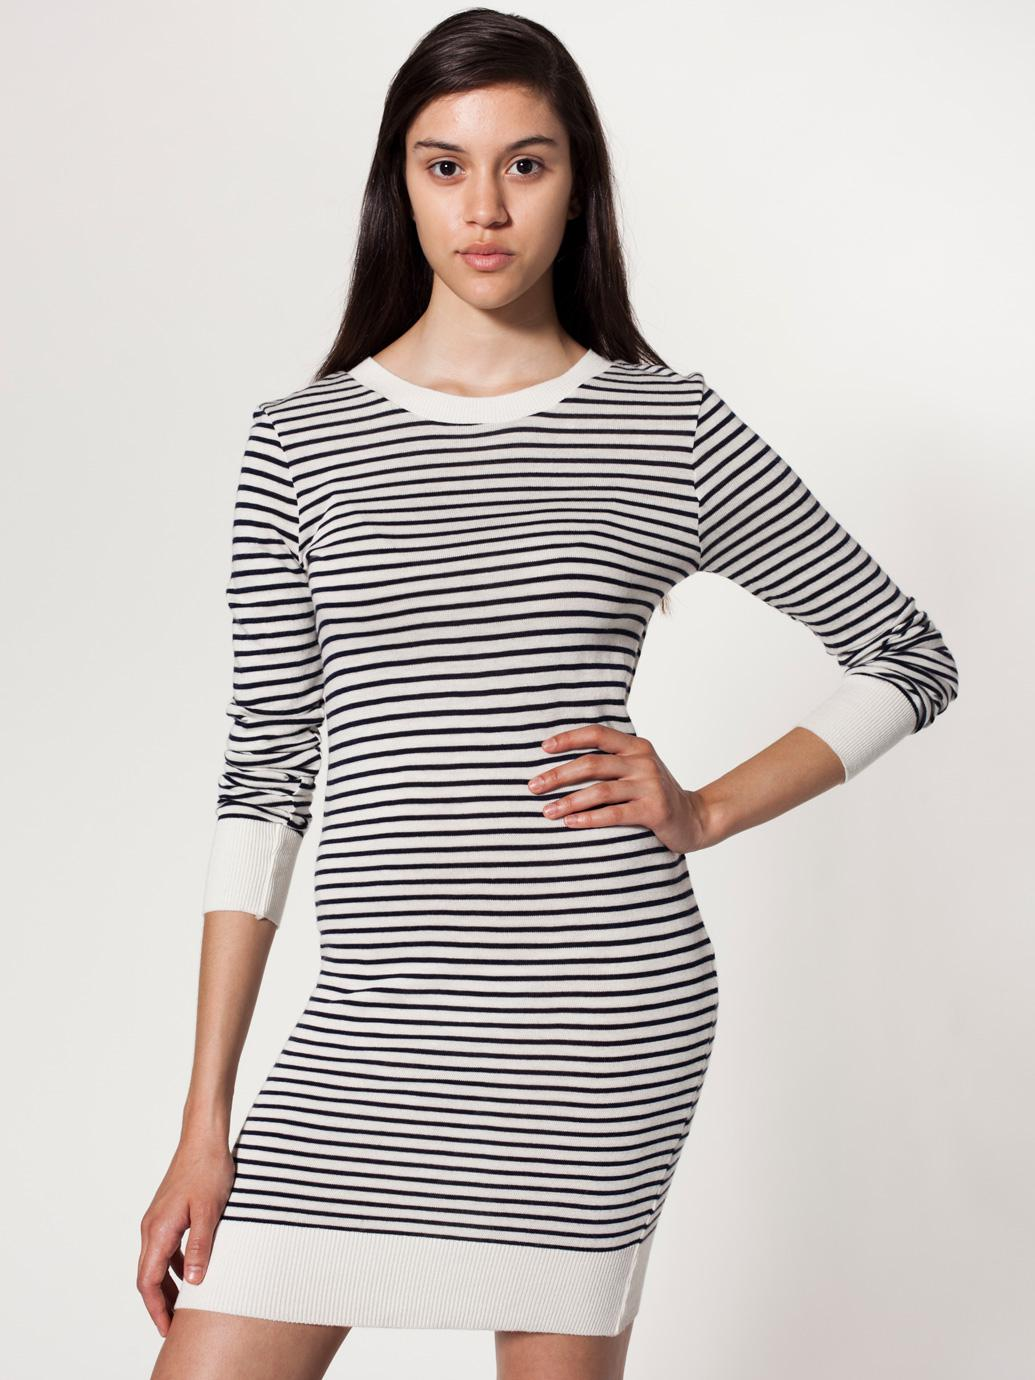 0d125c362ab5 Βραδυνα Φορεματα American Apparel Aγοράστε τα πιο όμορφα Βραδινα Φορεματα  American Apparel